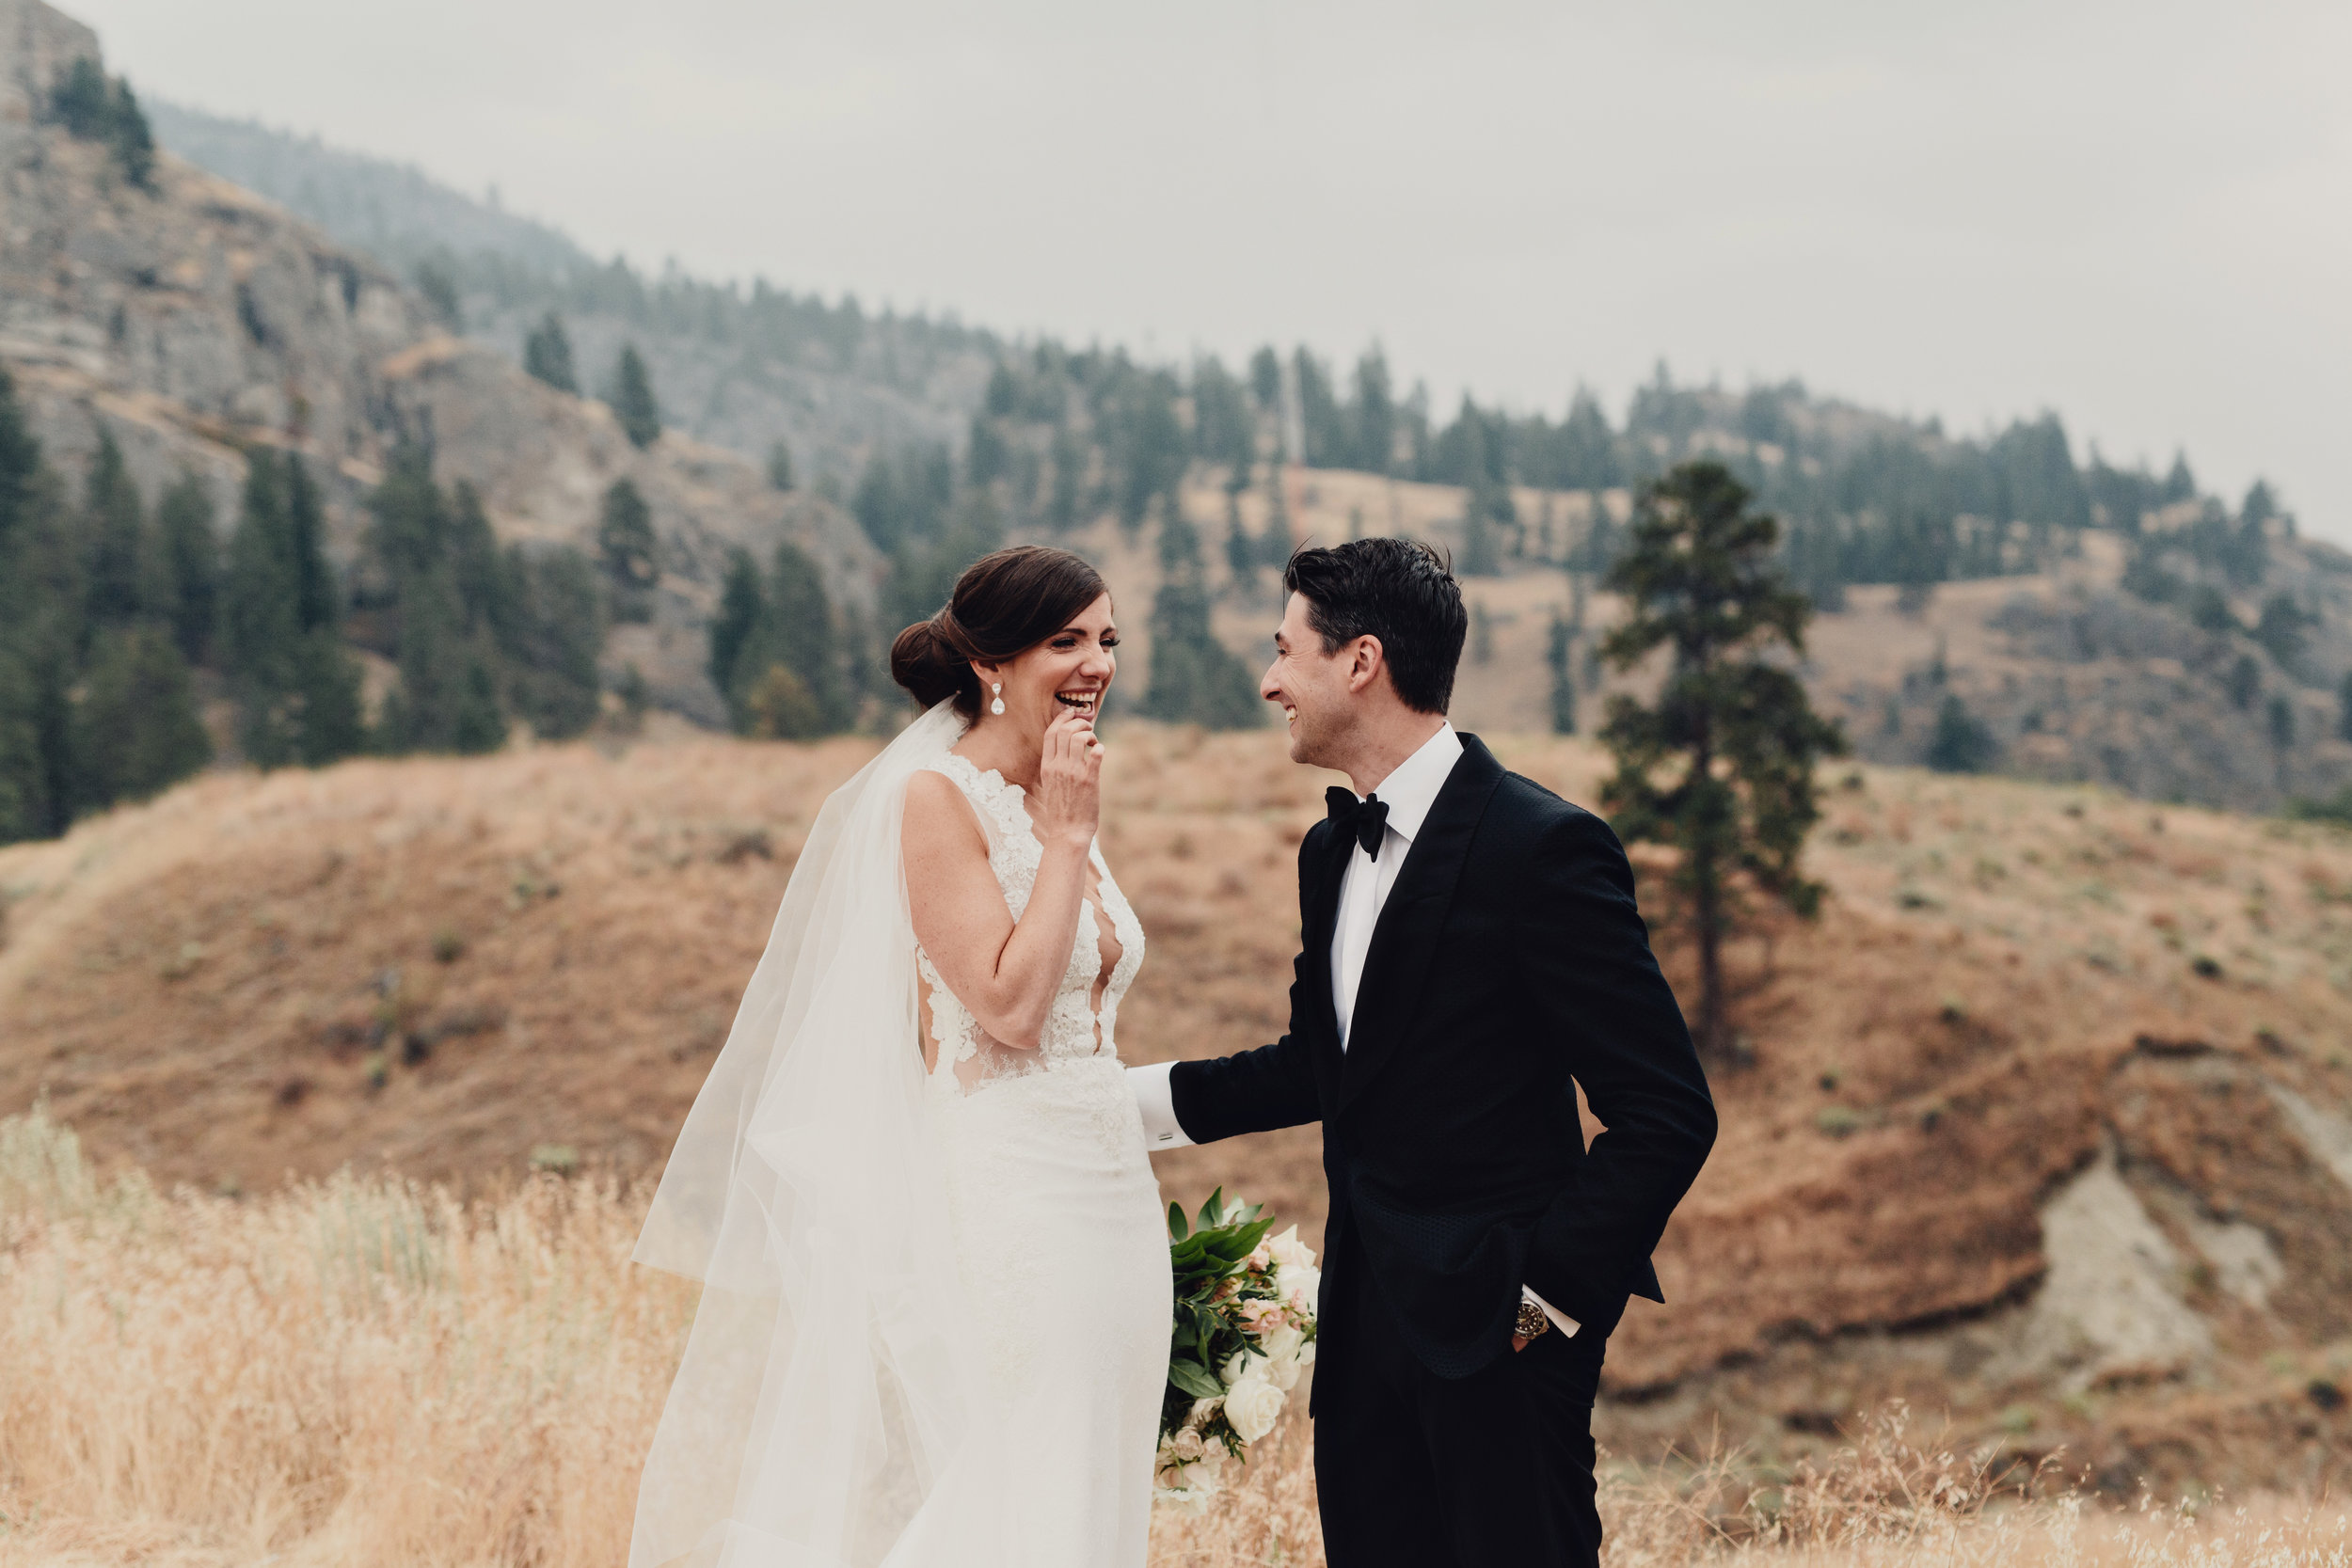 taylor-roades-wedding-0064.JPG